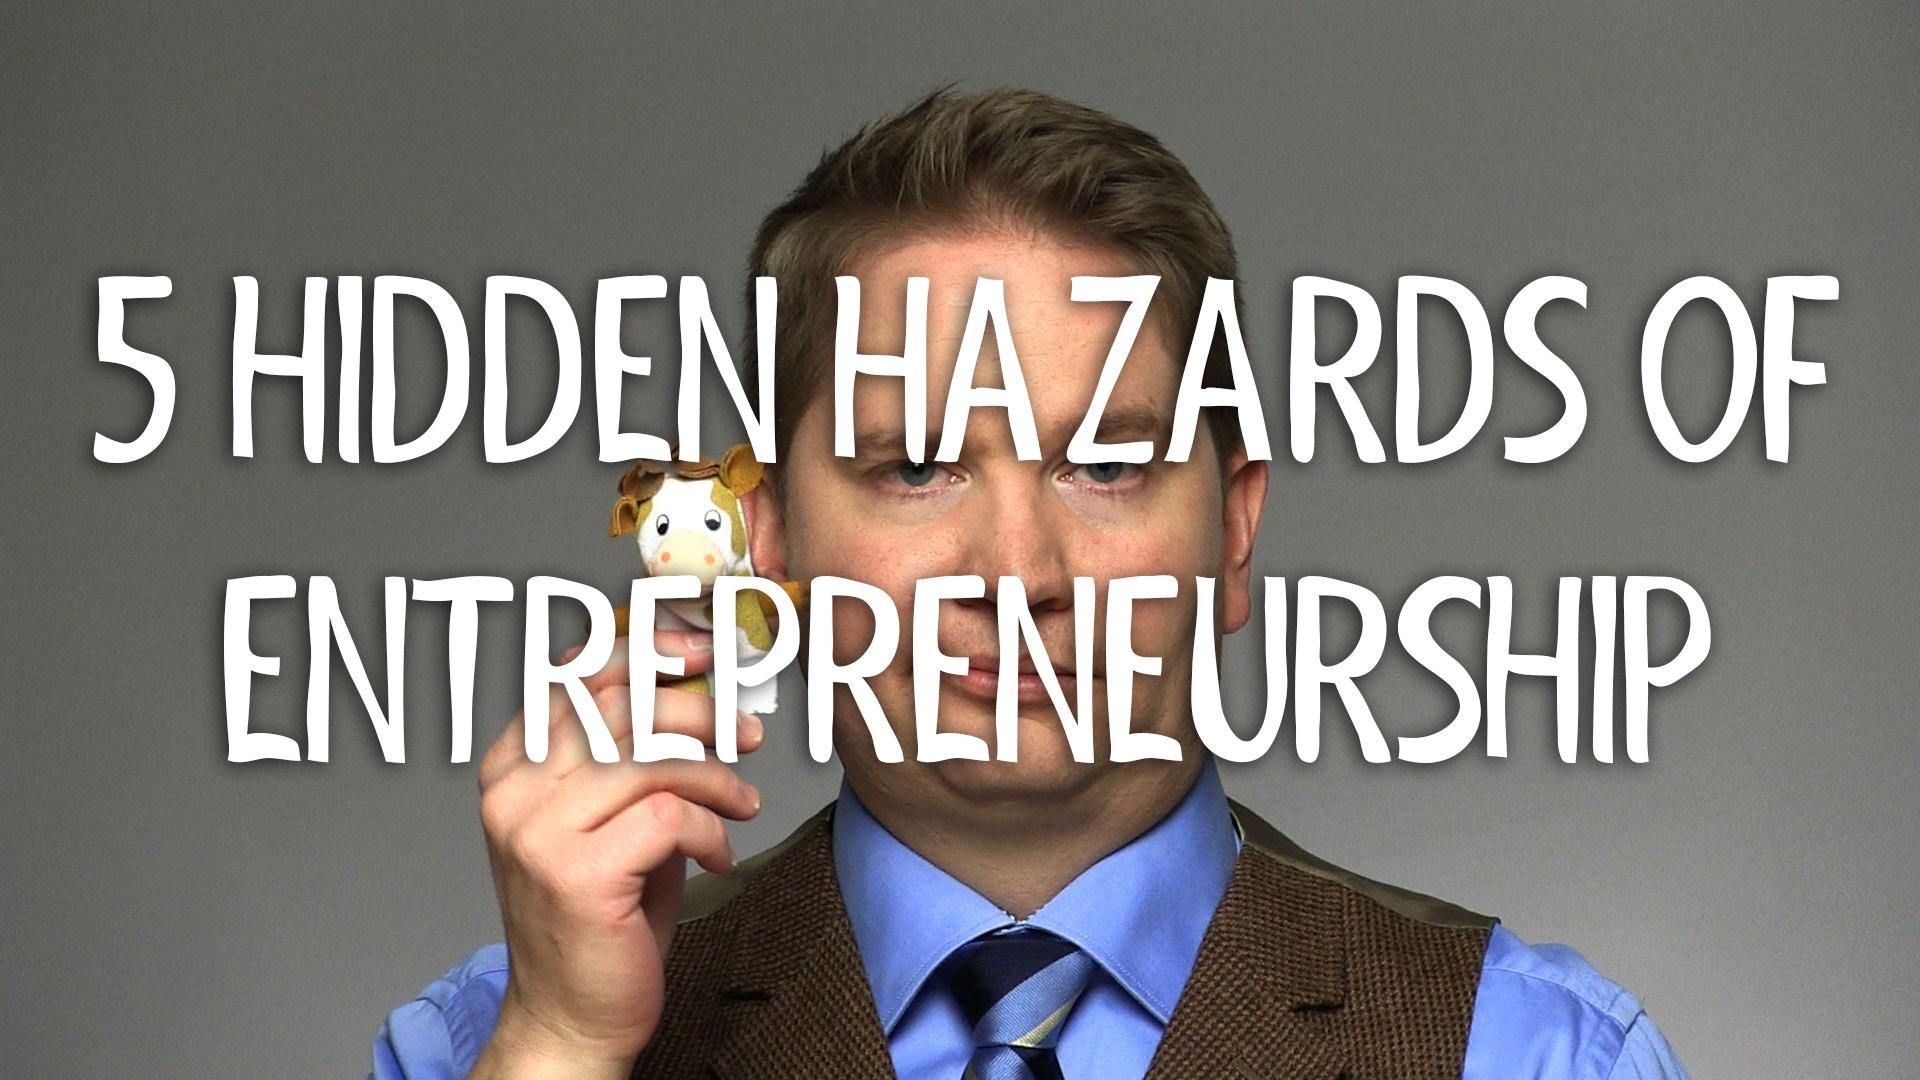 5 Hidden Hazards of Entrepreneurship